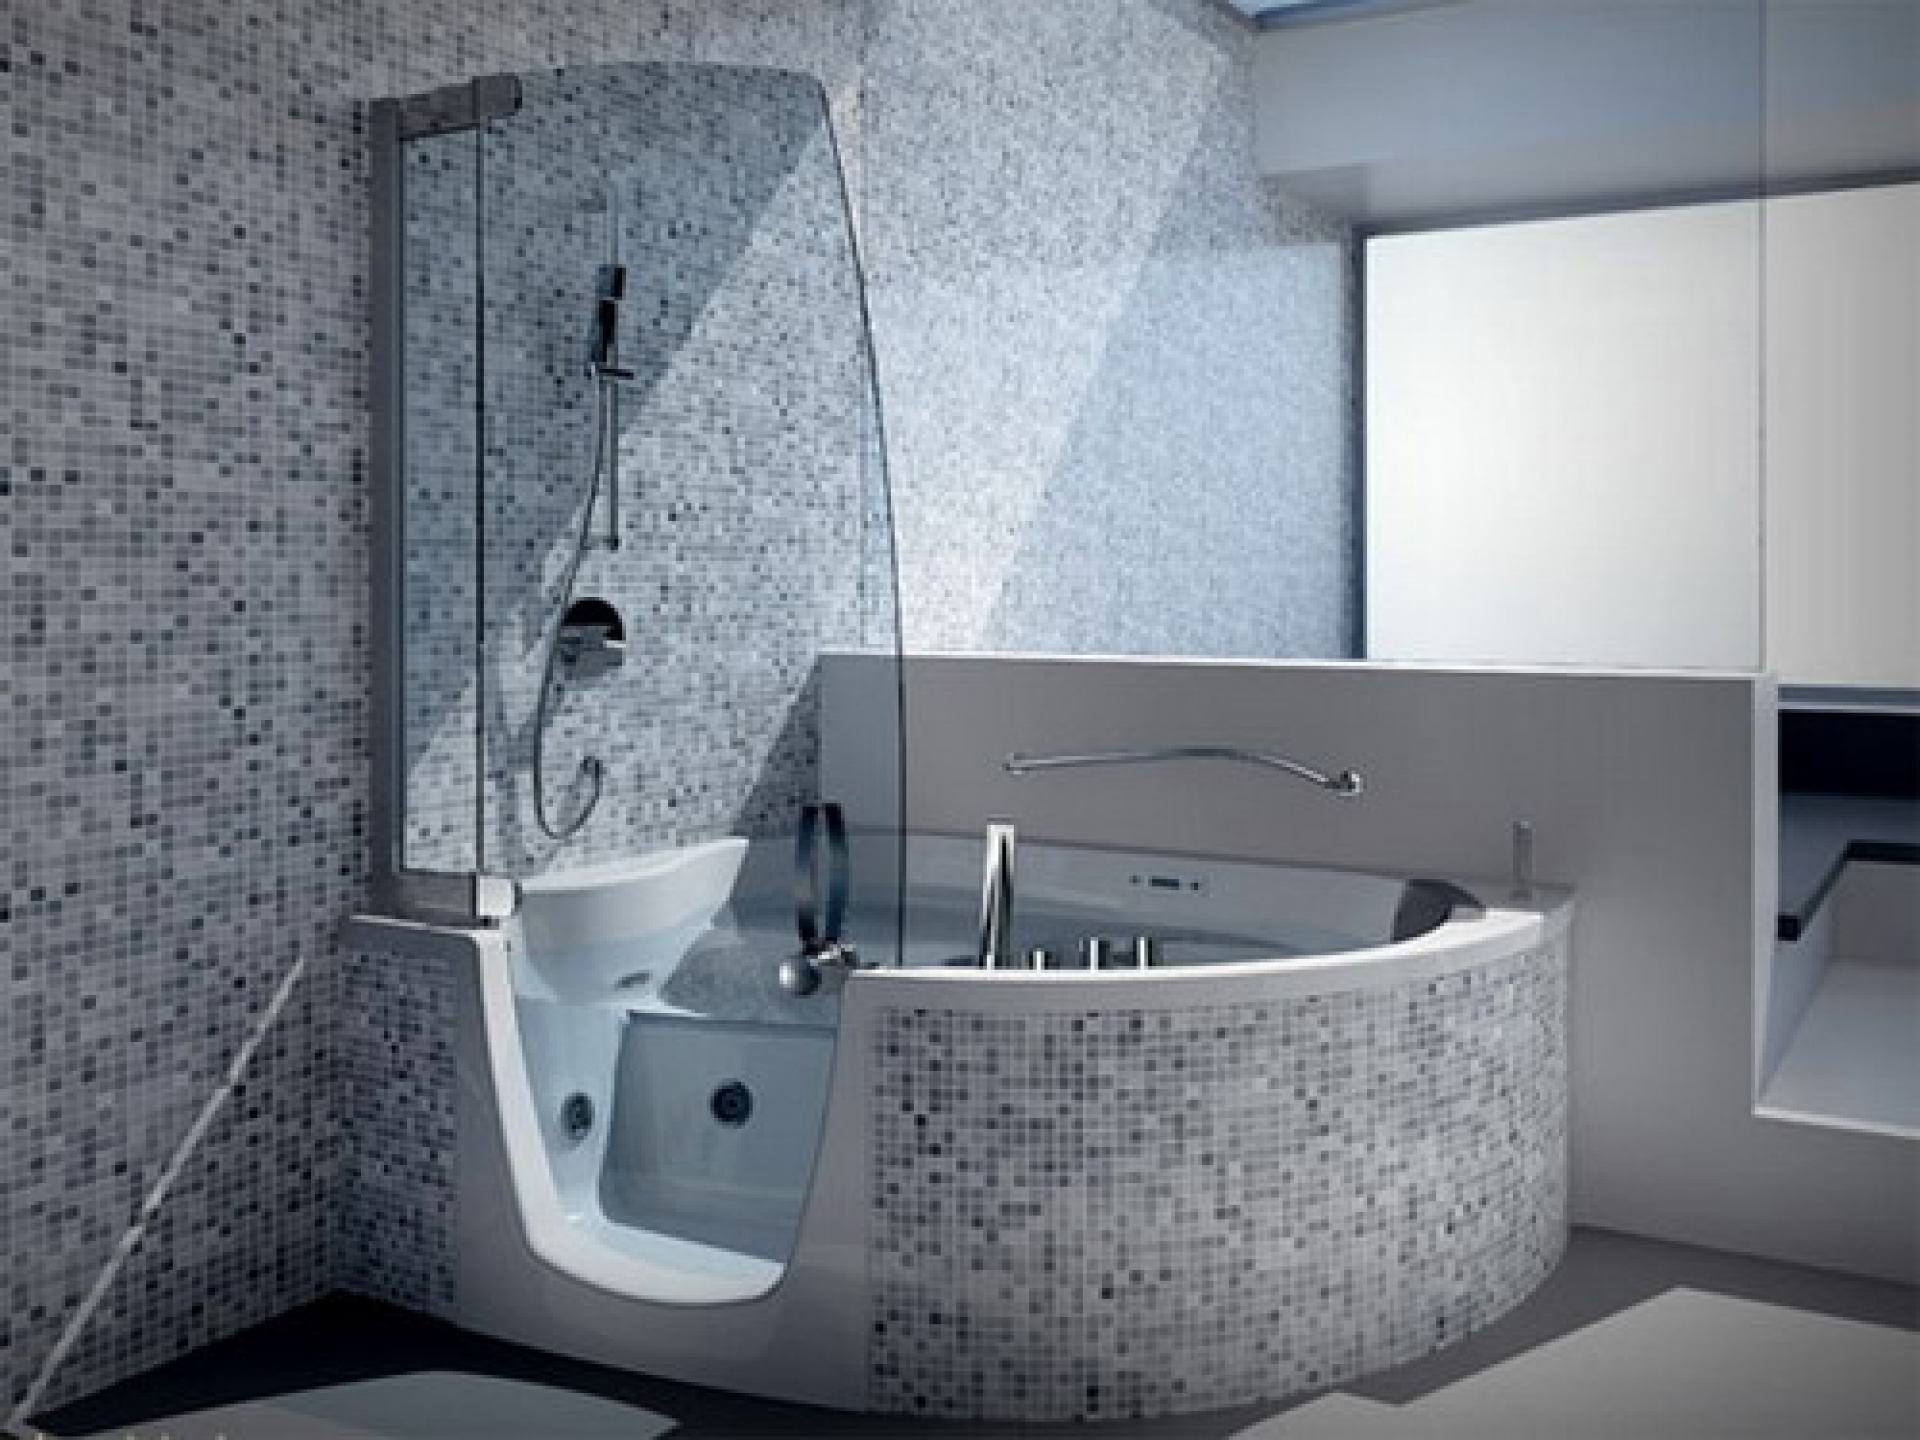 Ideas, kohler elliston tub and shower faucet kohler elliston tub and shower faucet showerhead faucet tub combos showerheads shower faucets 1920 x 1440  .